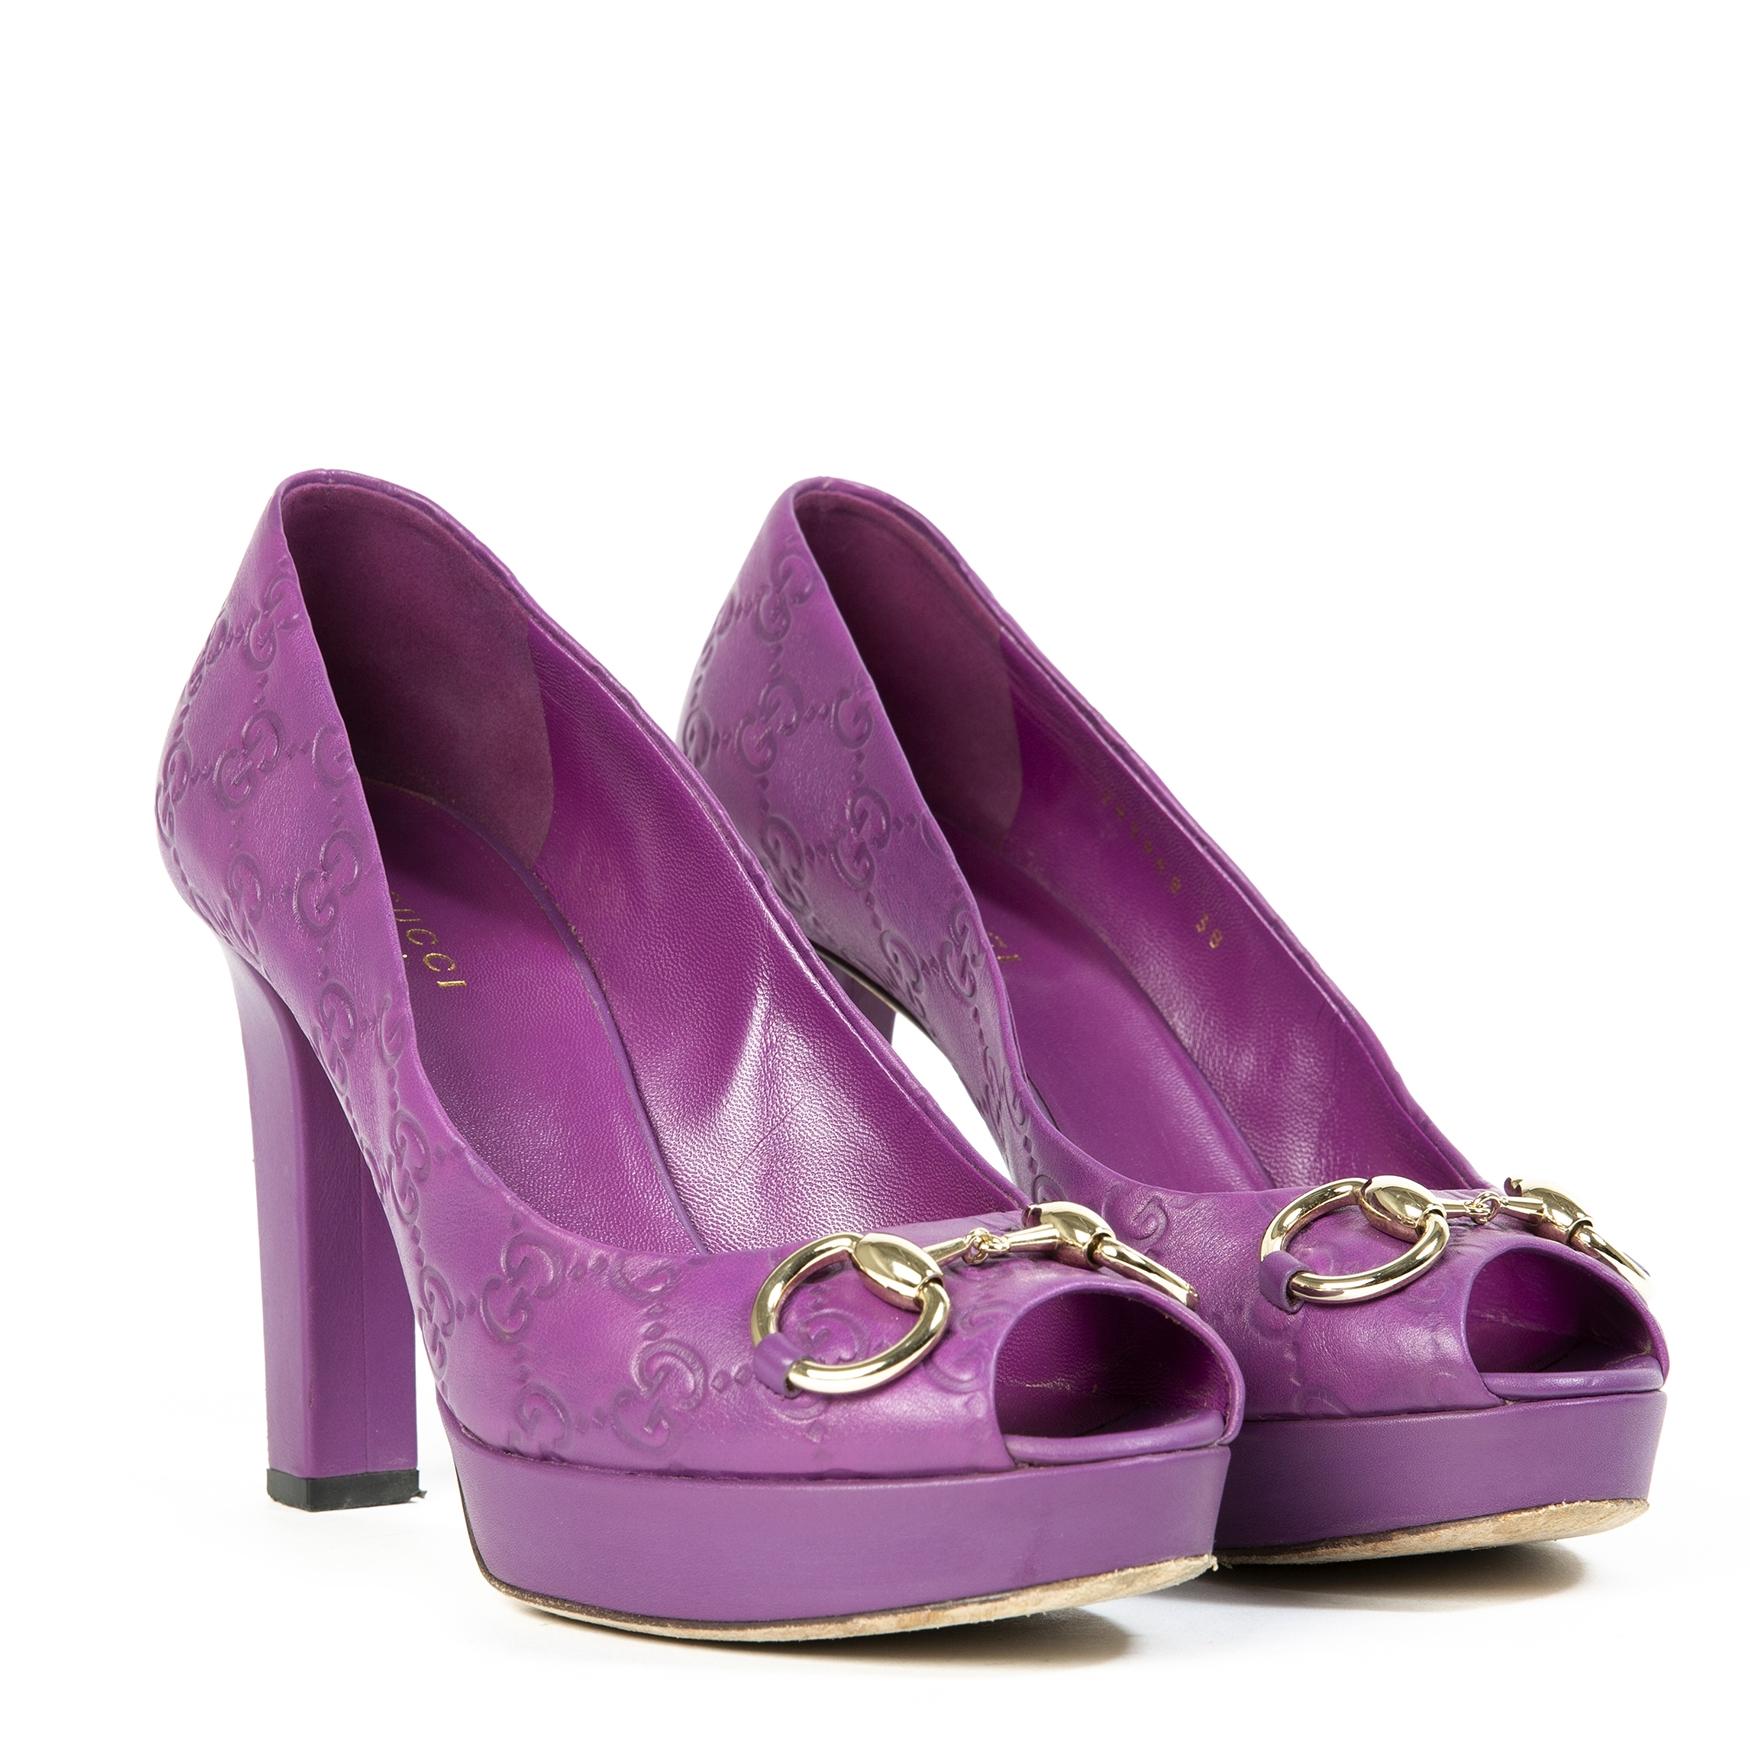 ab5a91496c3e Labellov Shop Vintage Luxury Designer Handbags   Fashion   Shoes ...